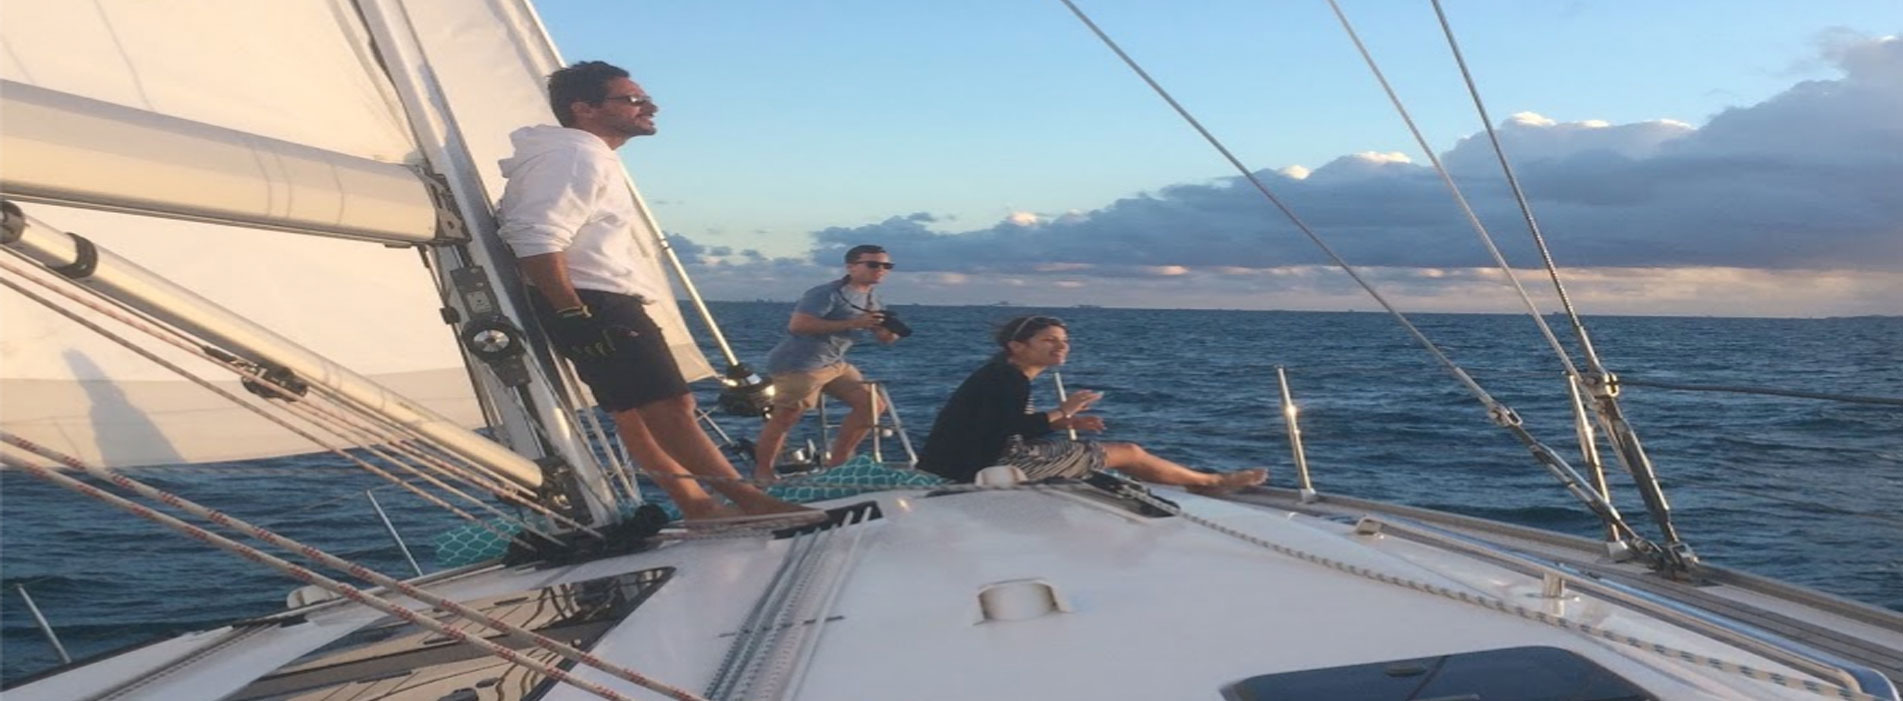 JAZZIA-ocean-sailing-charters-perth-wa